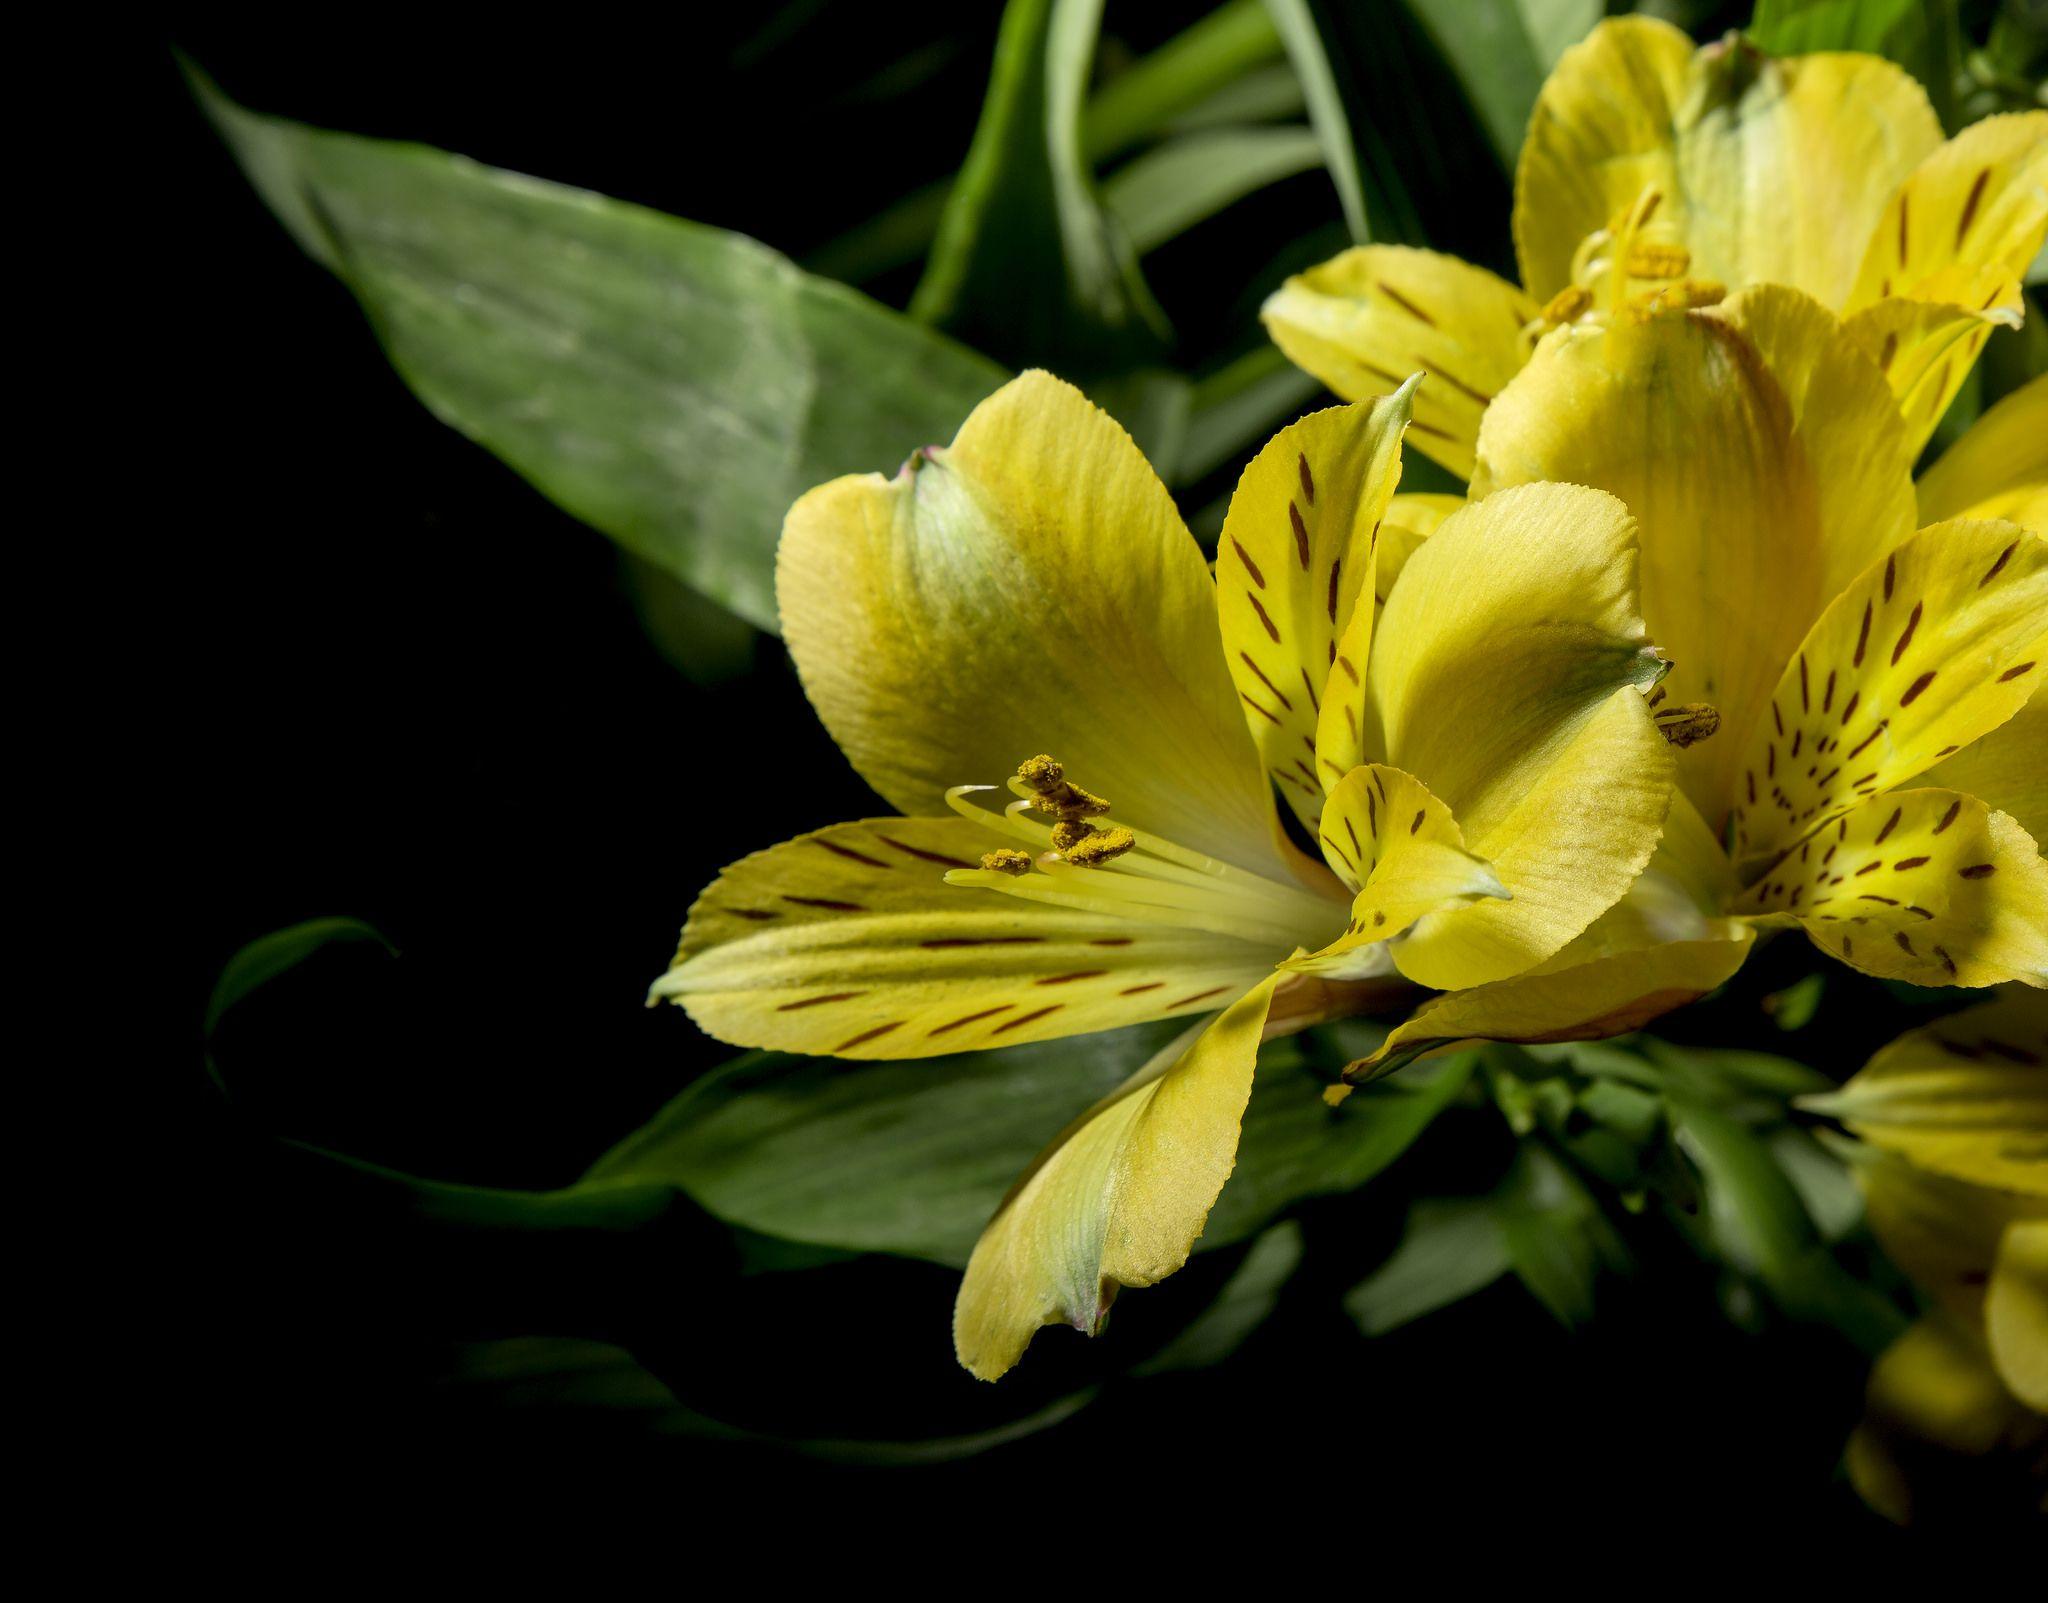 Yellow Alstroemeria Alstroemeria Peruvian Lilies Planting Flowers